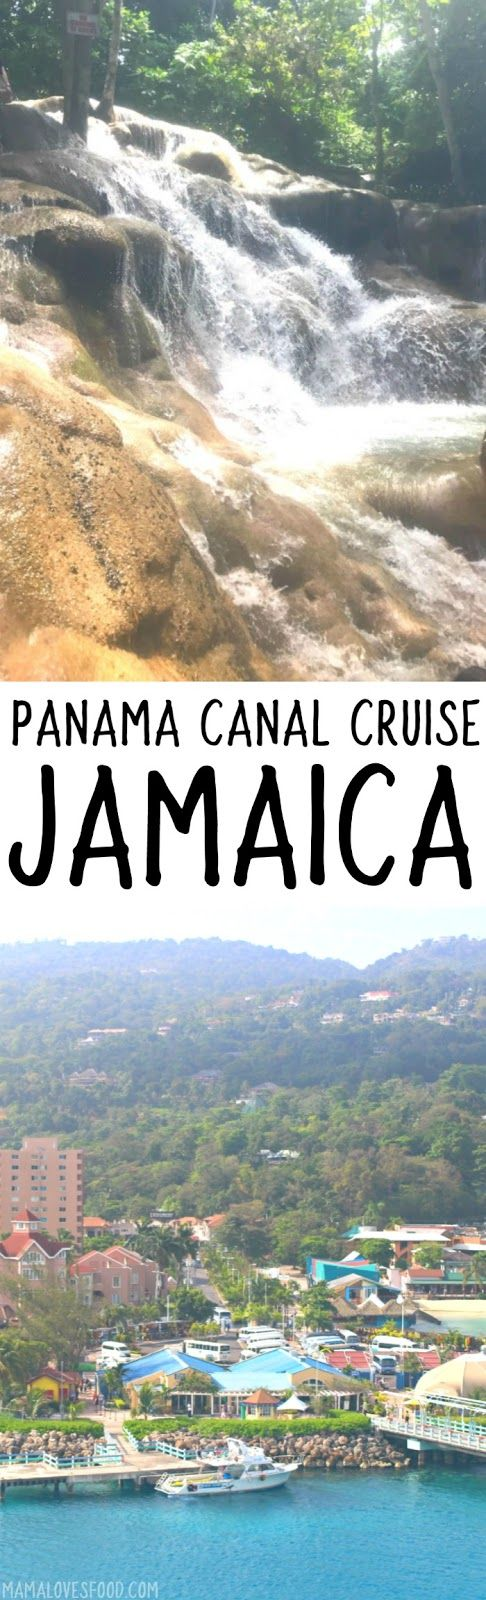 Visiting Ocho Rios Jamaica - Ten Day Cruise through the Panama Canal